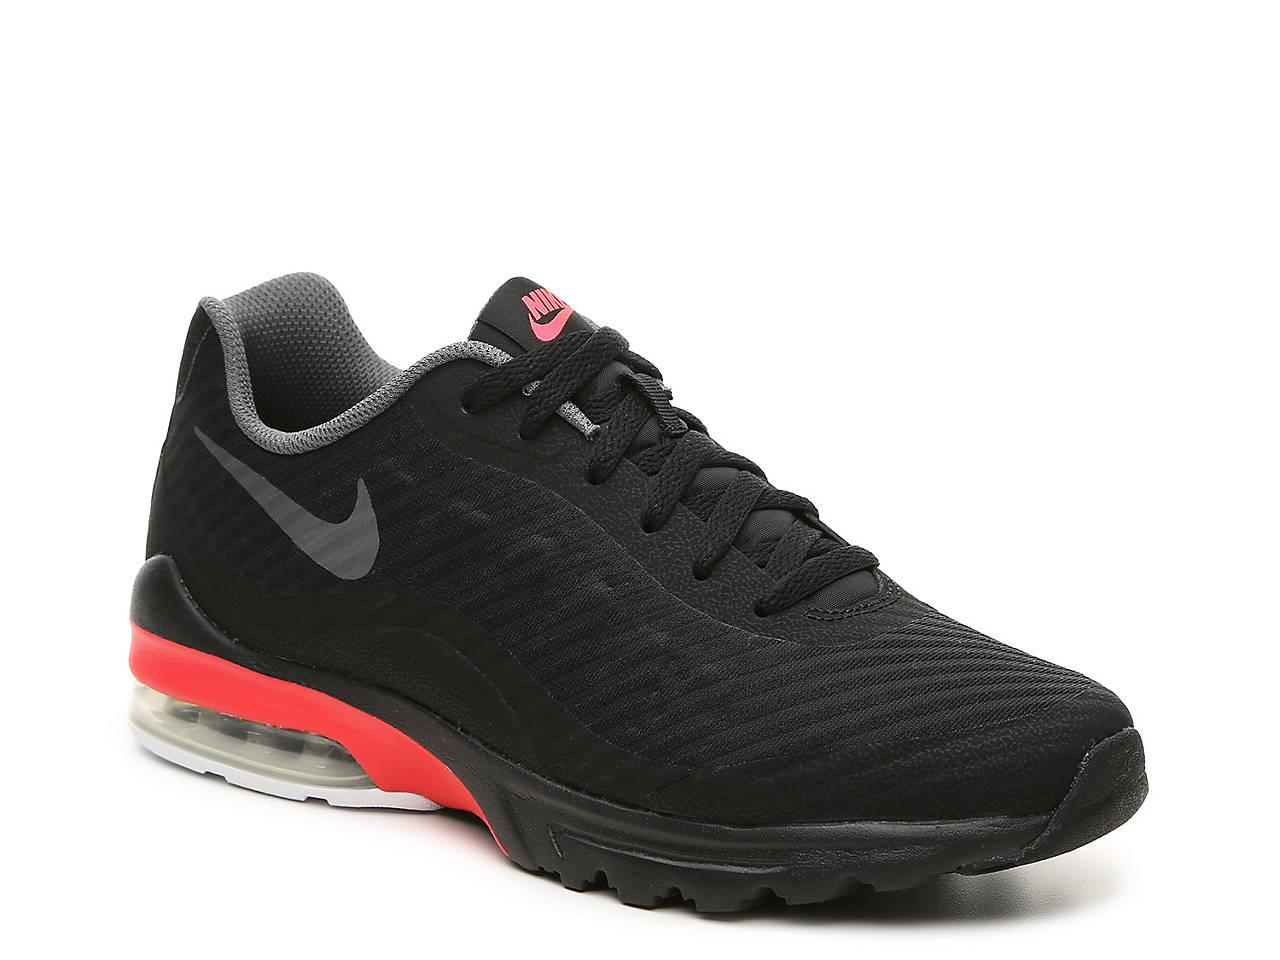 big sale 783a4 2a29a Nike. Air Max Invigor ...